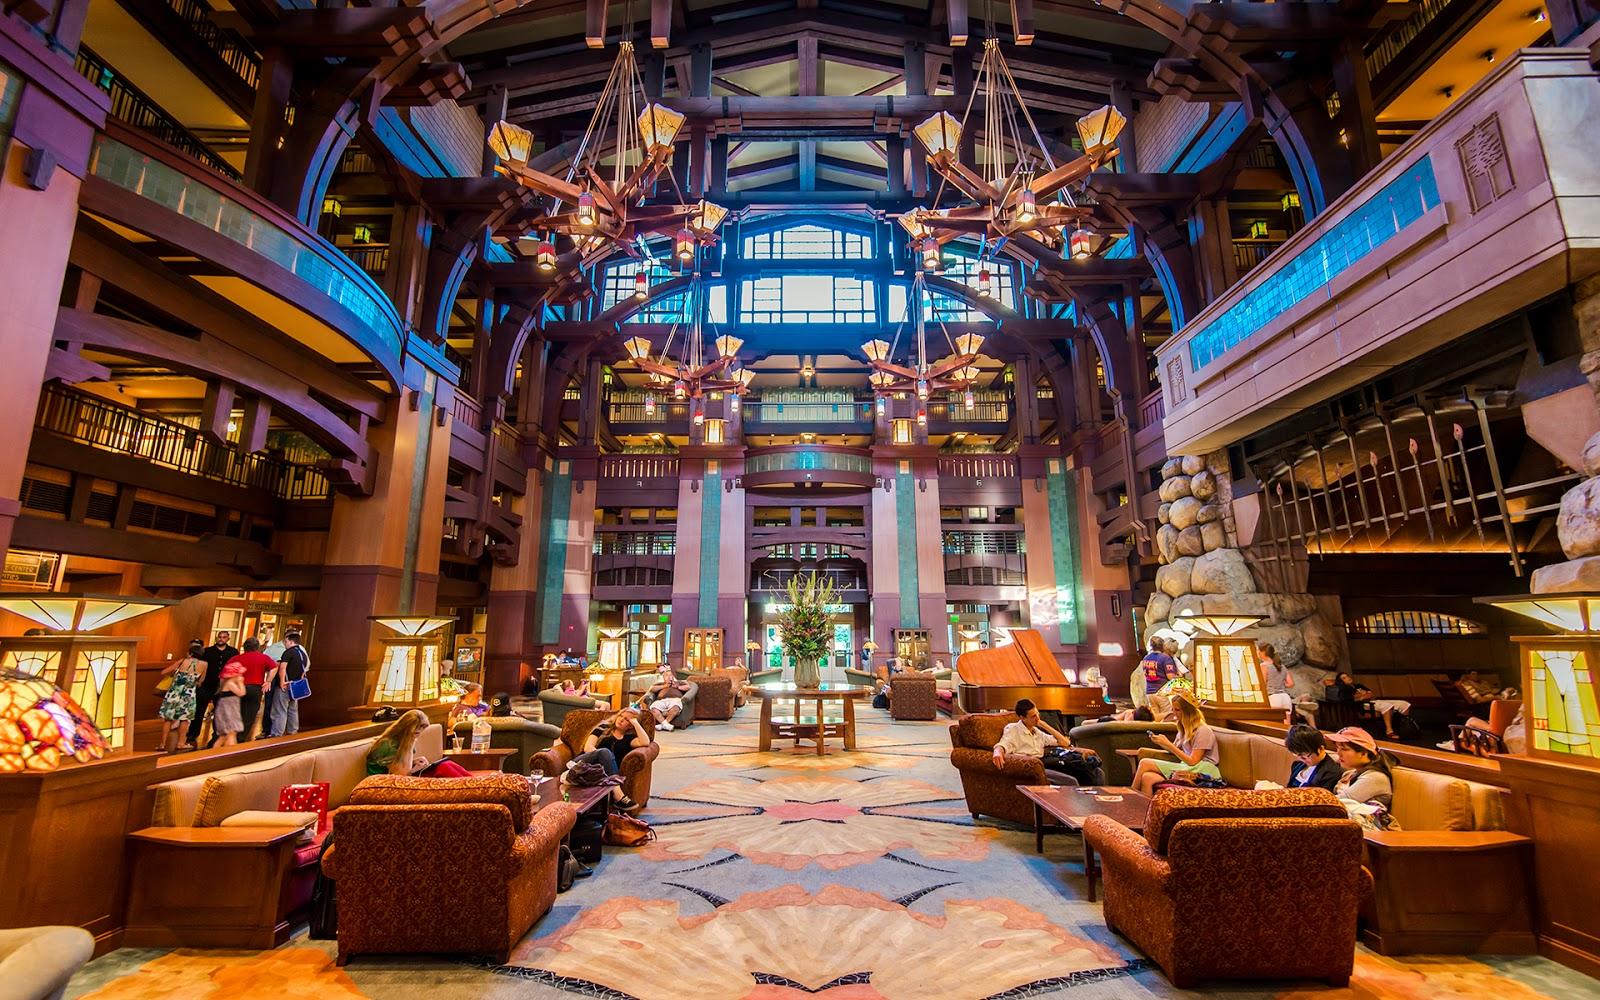 Disneyland Grand California Hotel